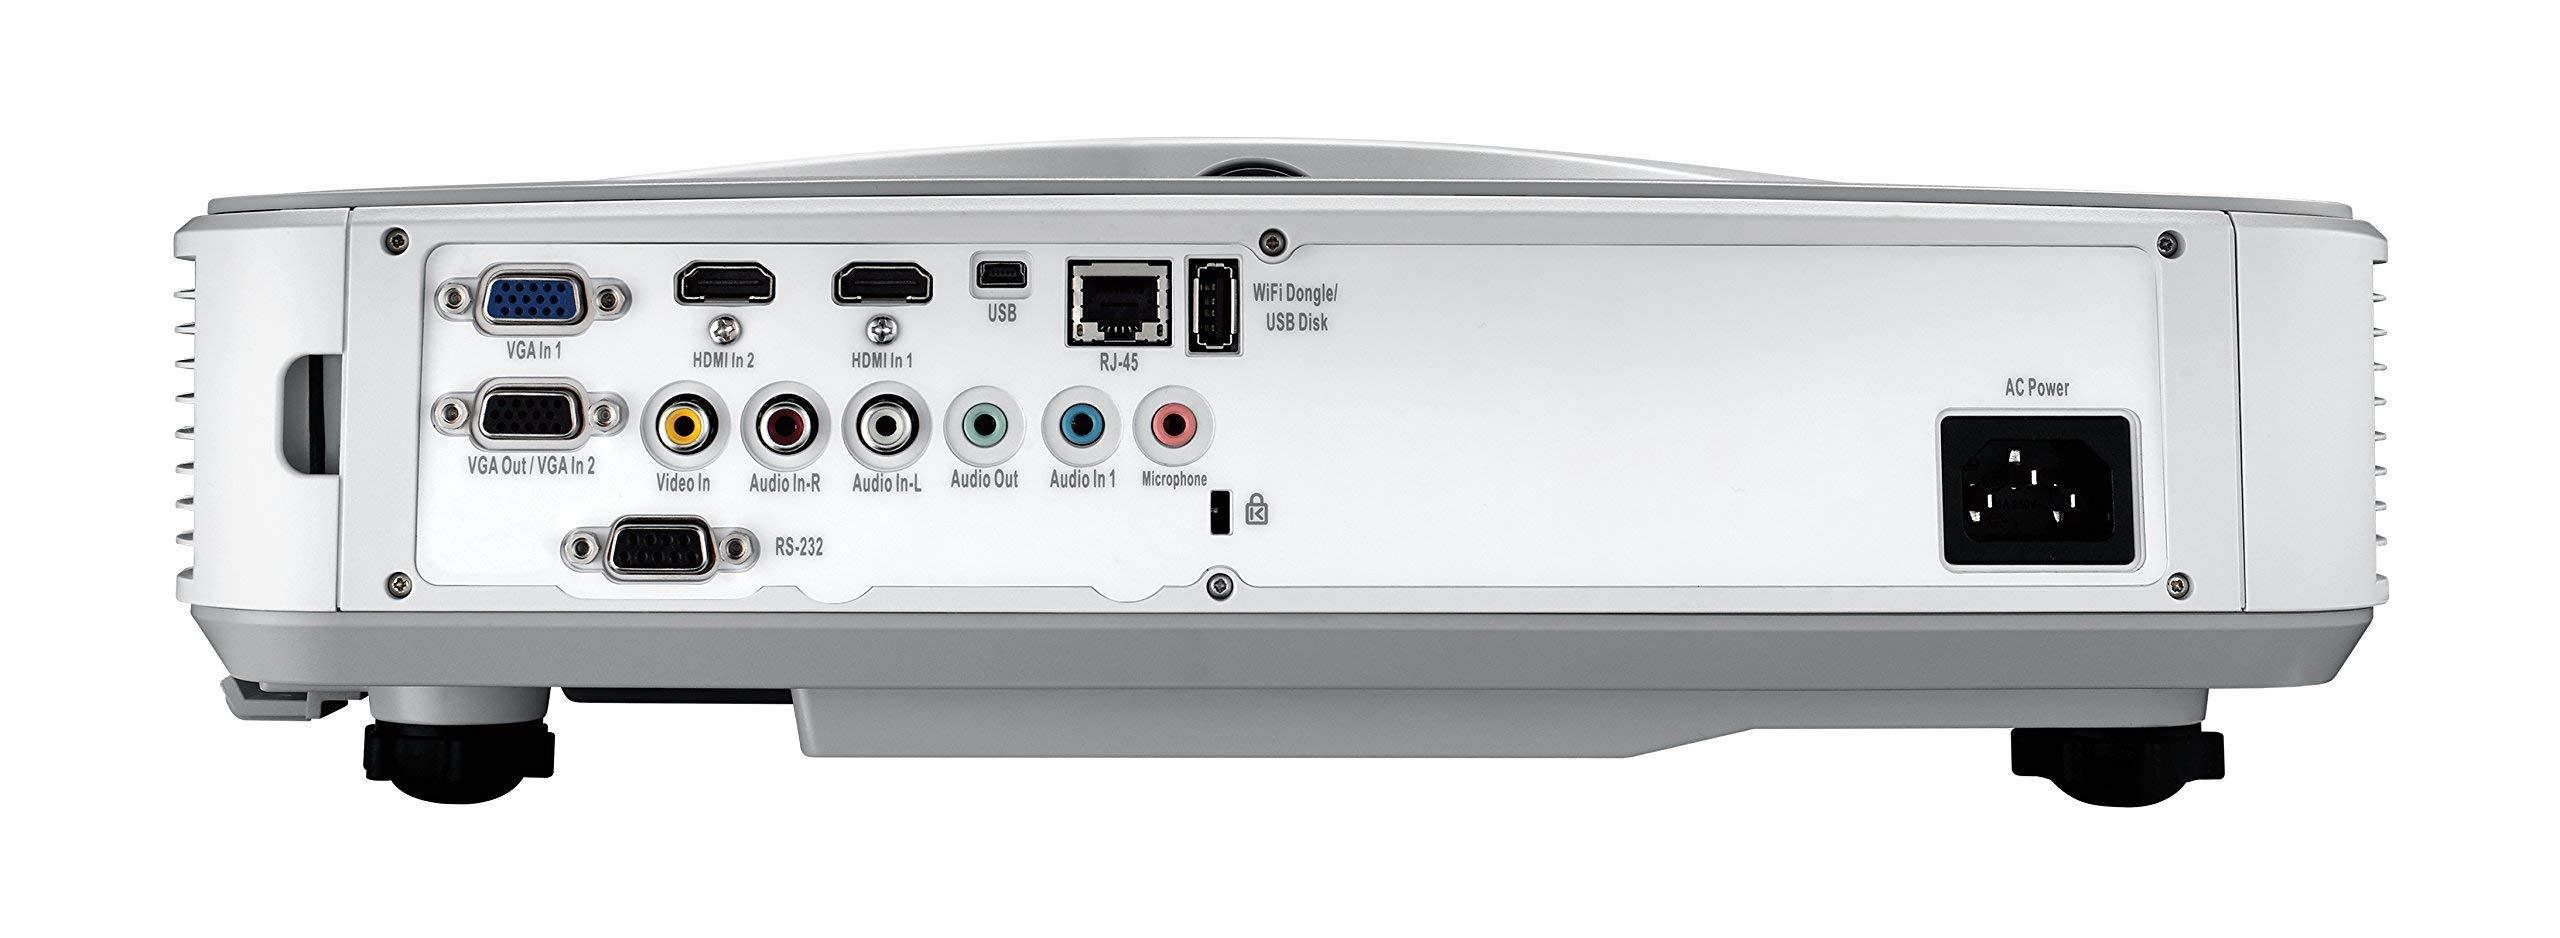 Optoma ZW300UST WXGA 3200 Lumens 3D DLP Ultra Short Throw Laser Projector (Renewed) by Optoma (Image #7)